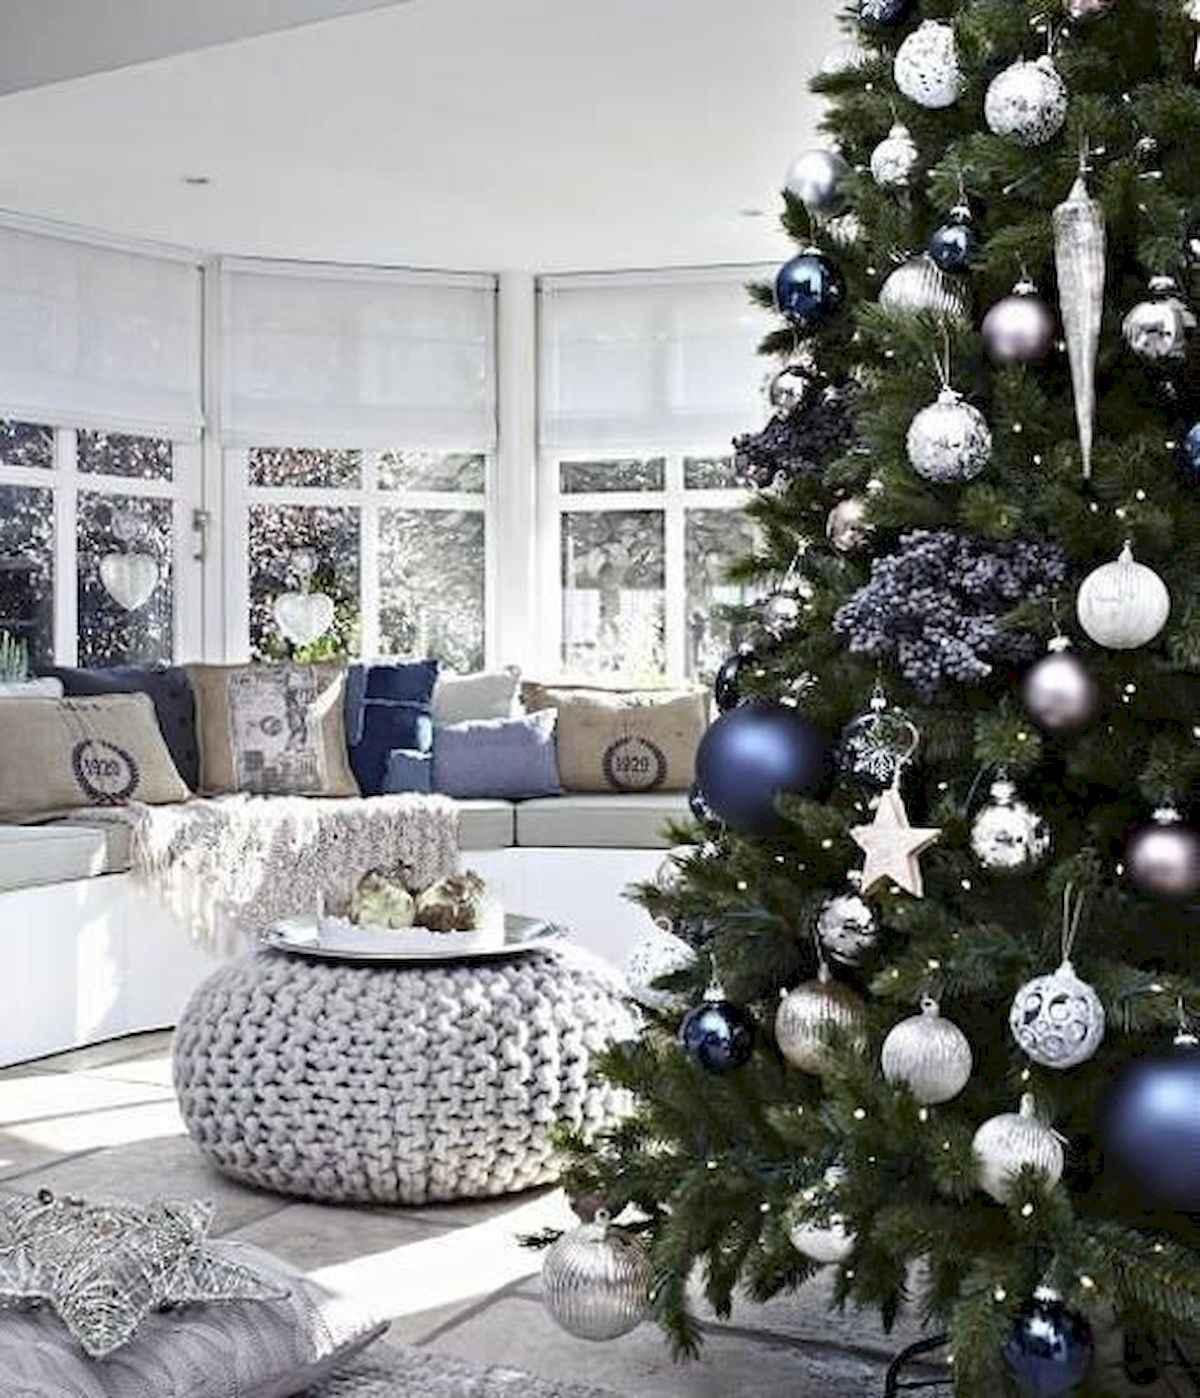 40 elegant christmas tree decorations ideas (34)